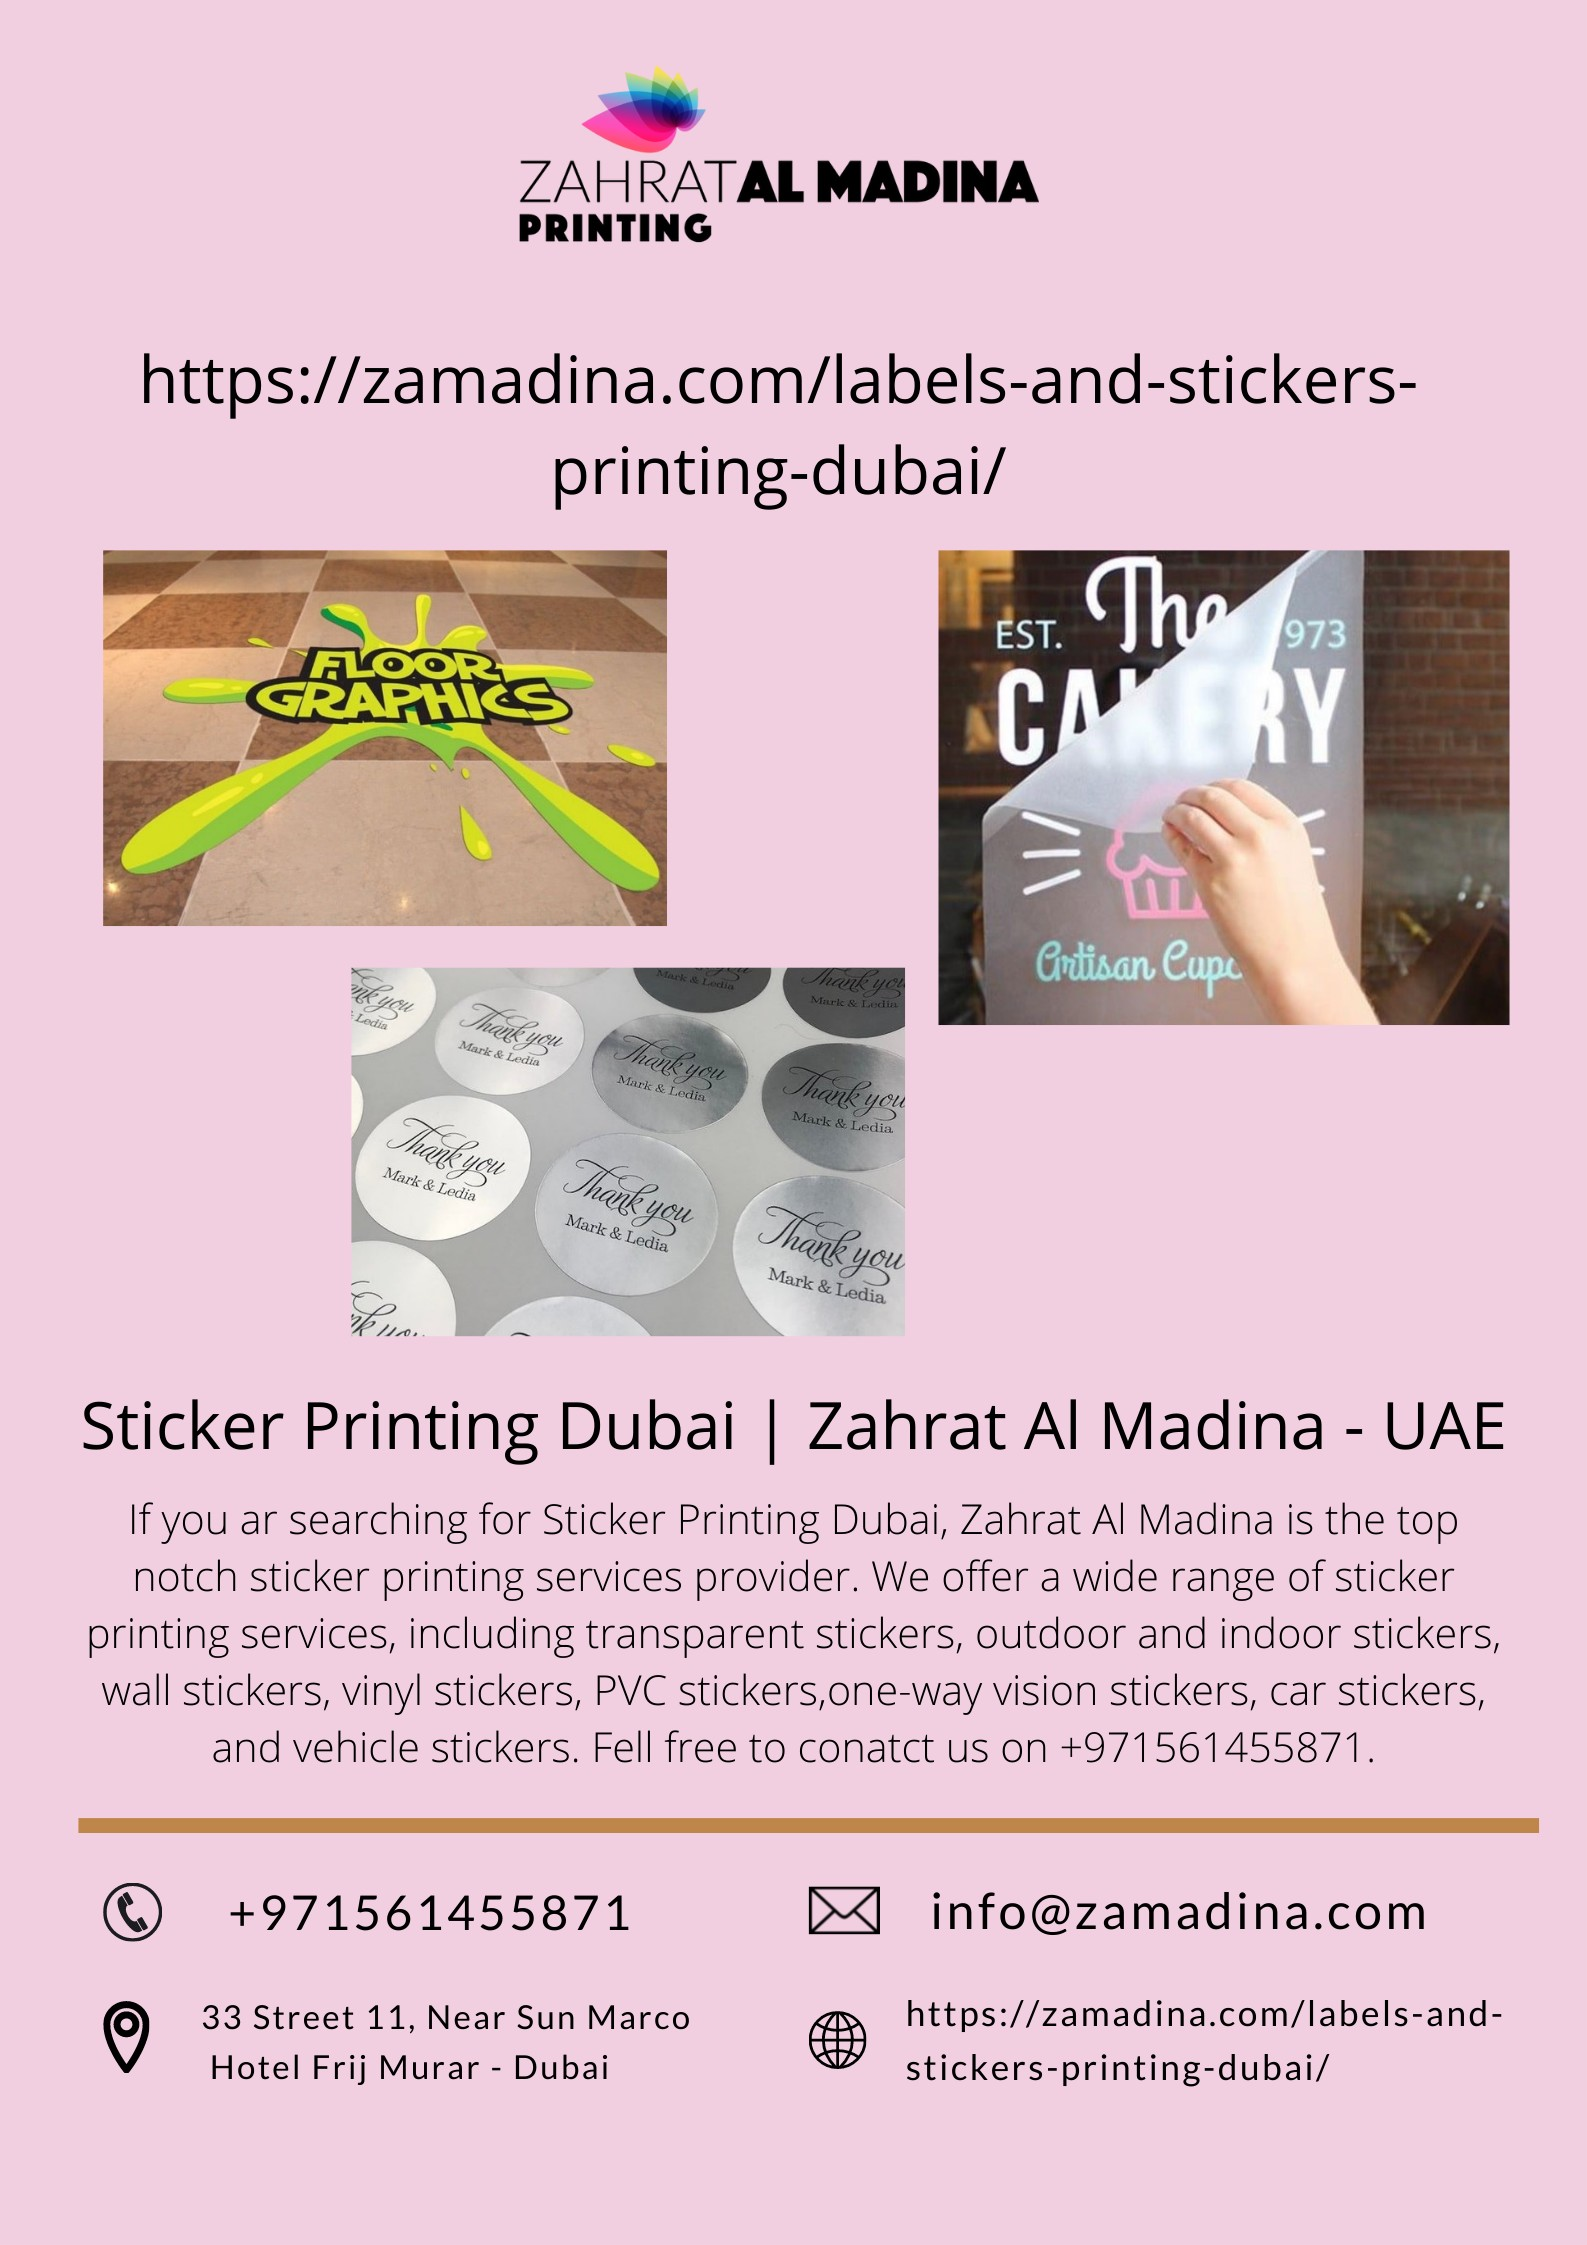 Sticker Printing Dubai | Zahrat Al Madina - UAE